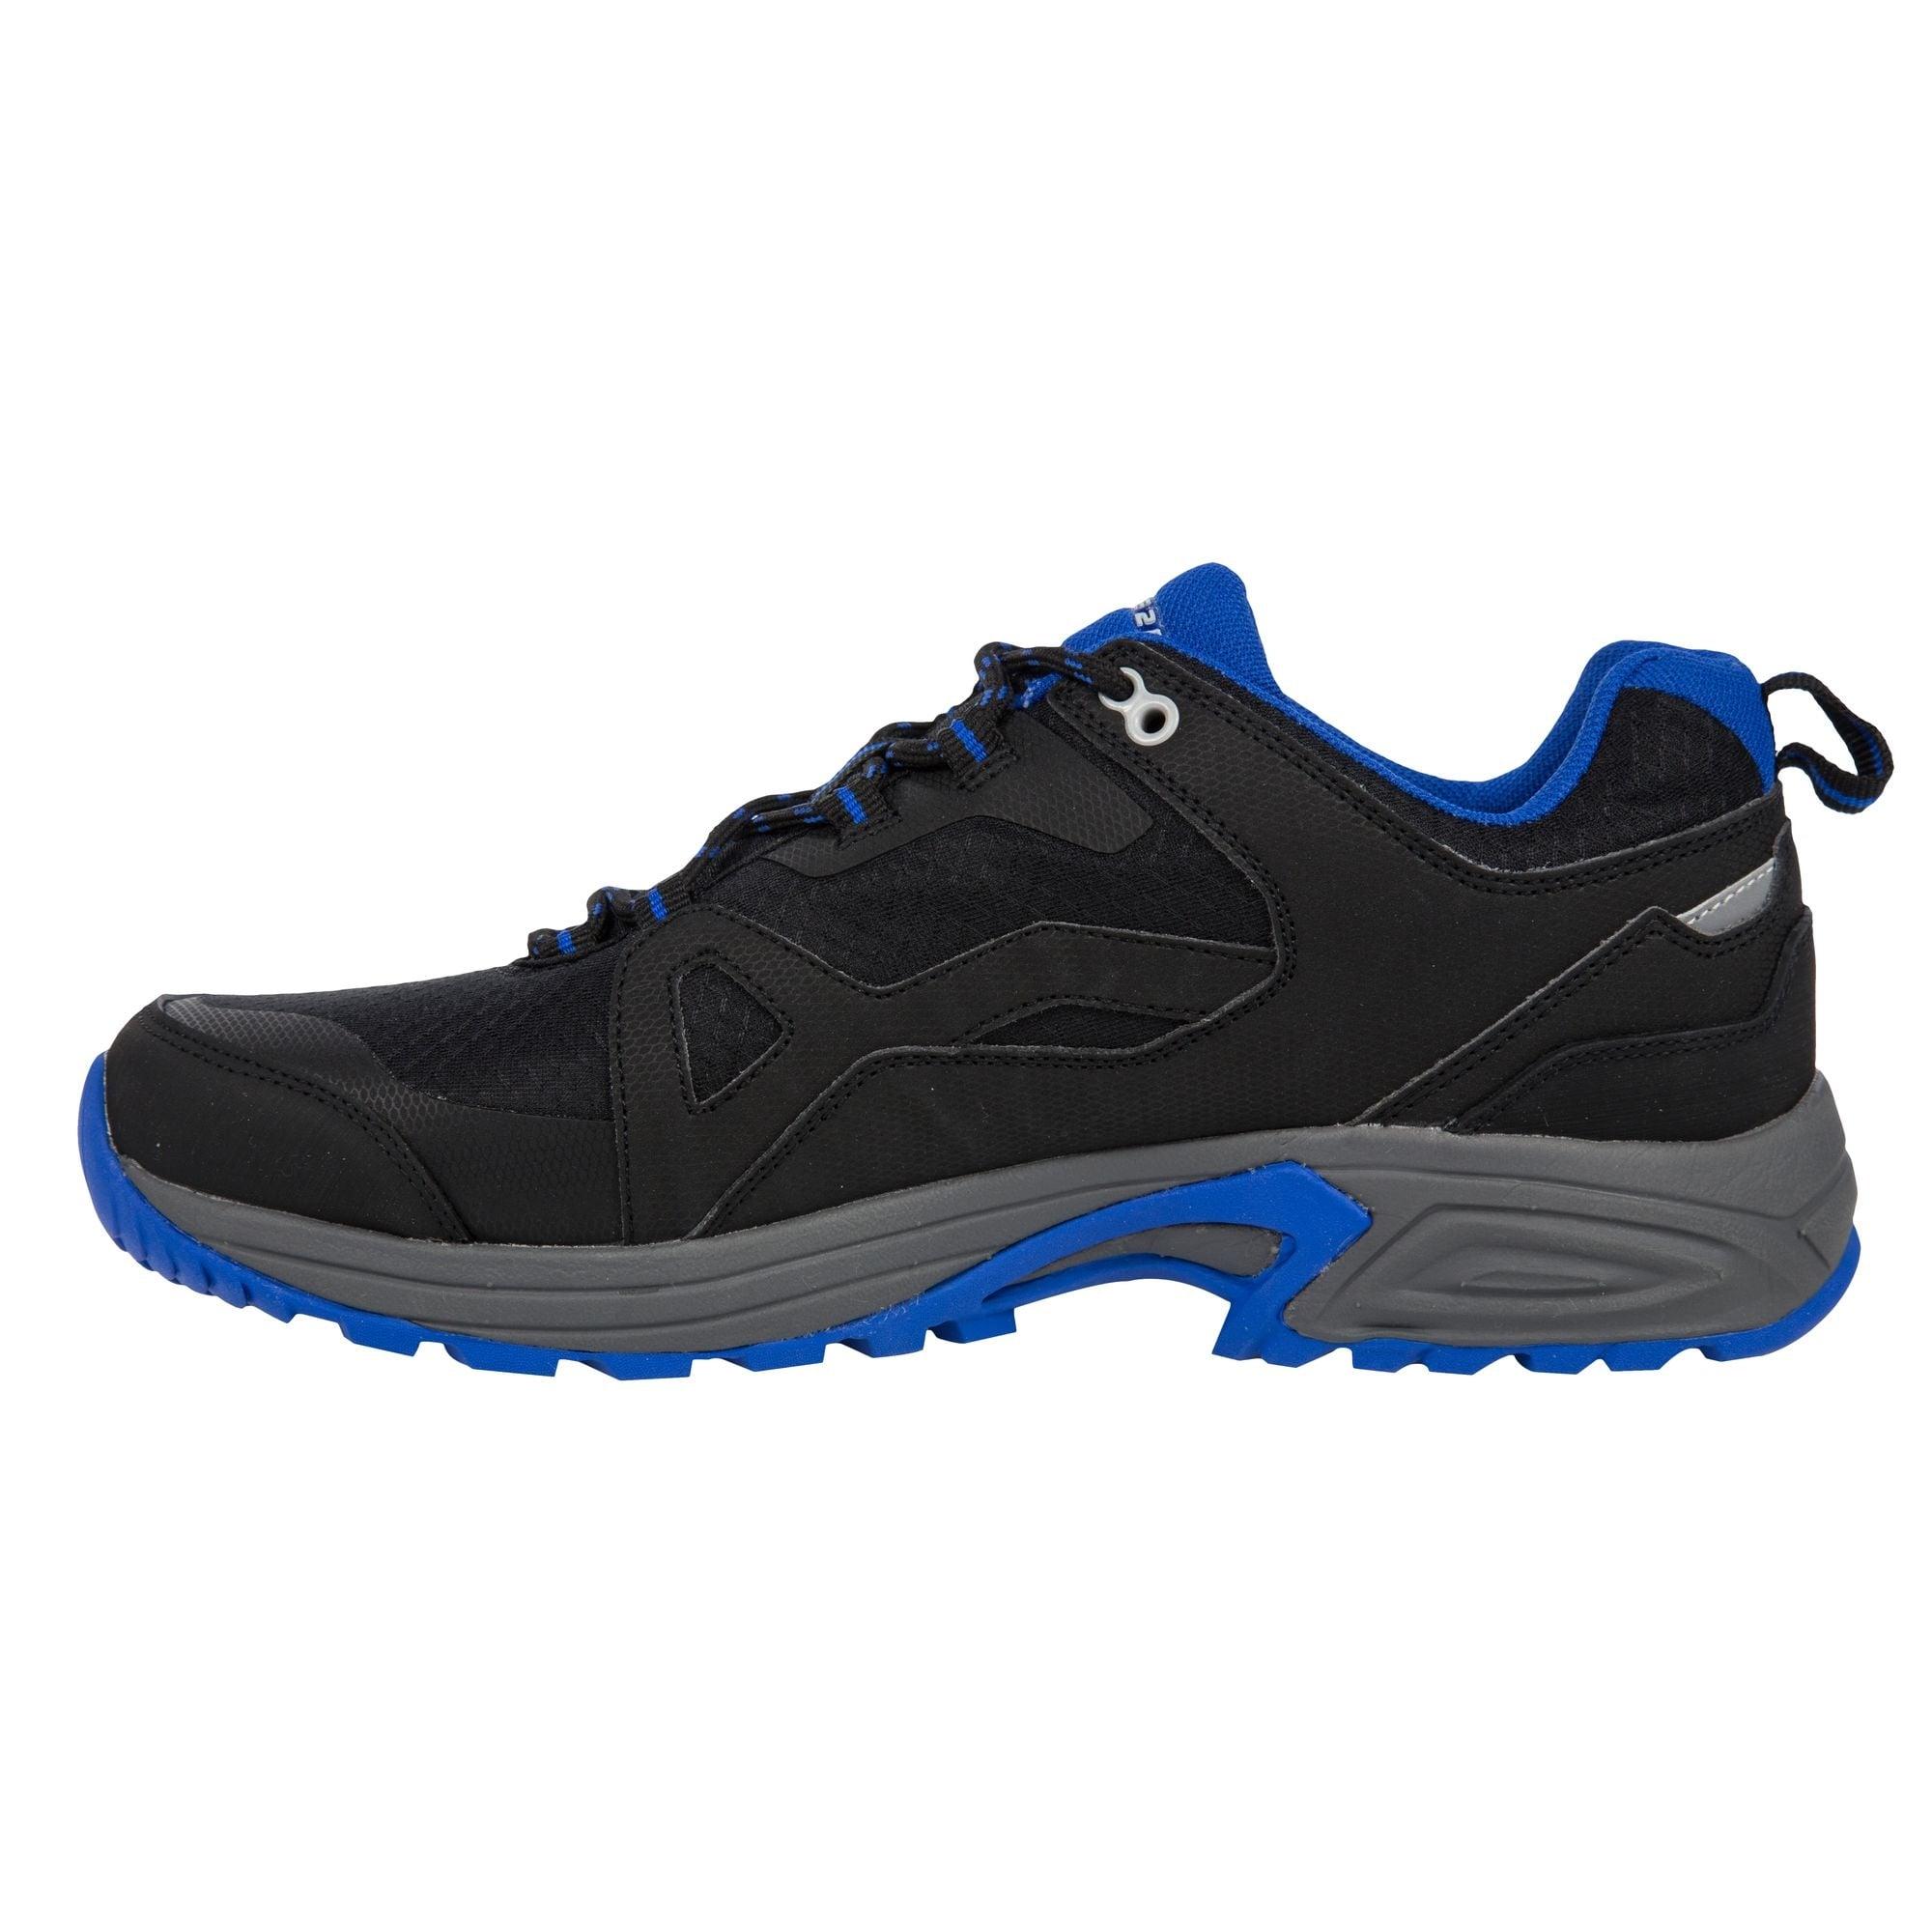 Dare2B-Cohesion-Mens-Waterproof-Lightweight-Low-Hiking-Walking-Shoes thumbnail 4